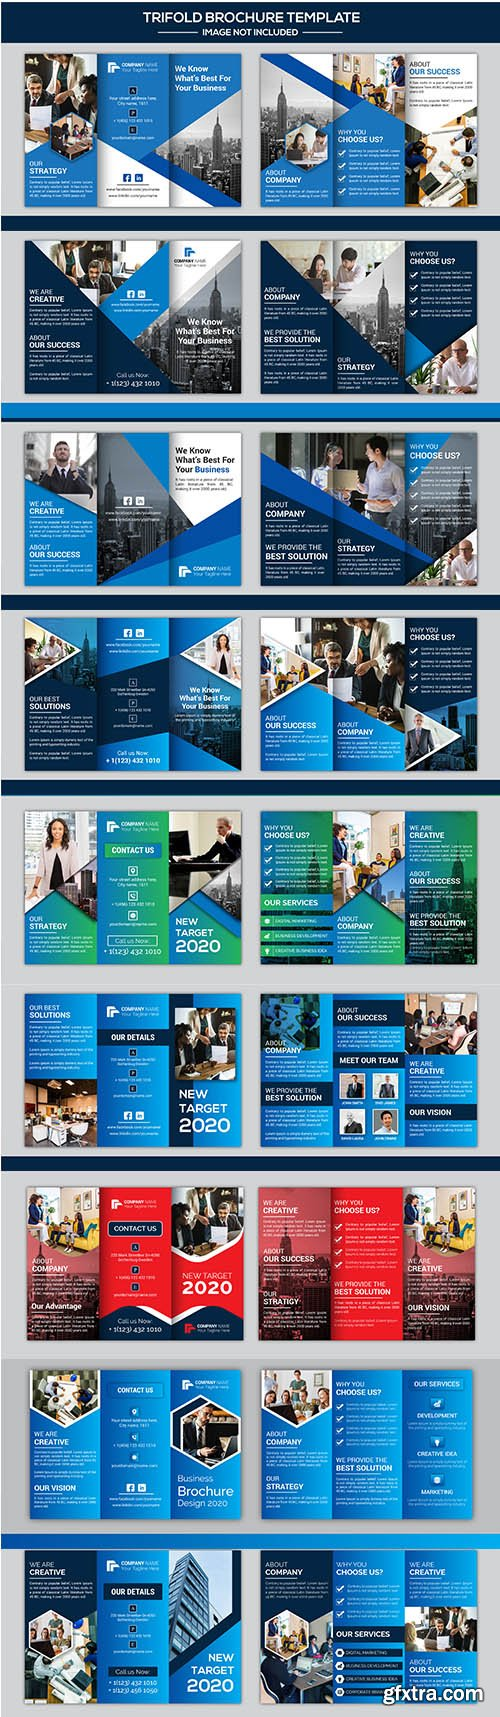 Company Business Trifold Brochure Design